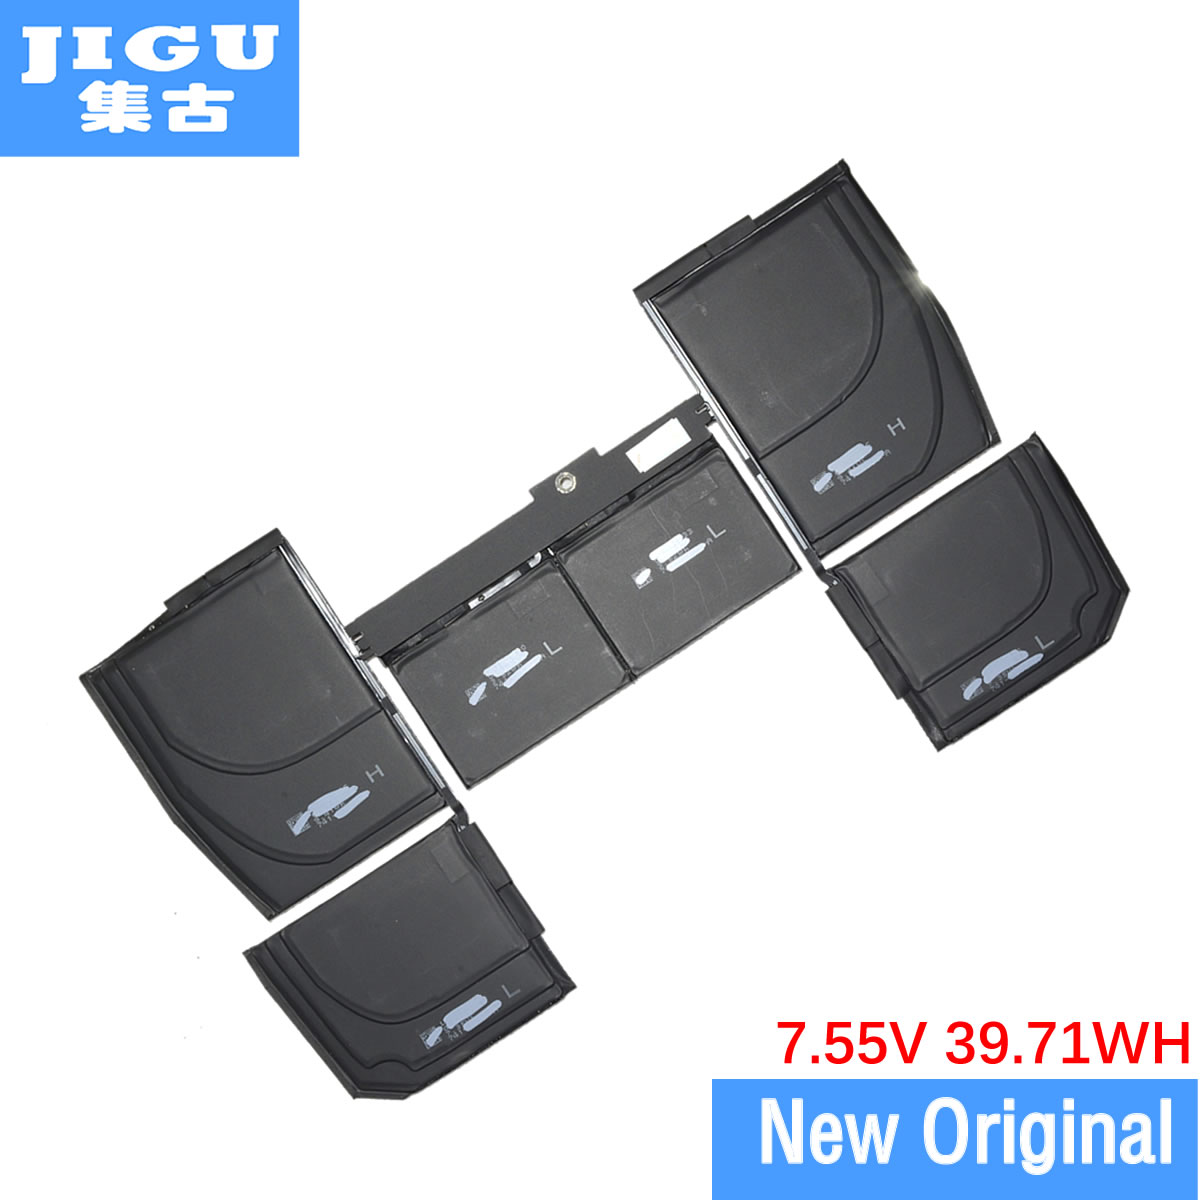 "JIGU A1527 Original Laptop Battery For APPLE ForMacBook 12 "" Retina A1534 YEAR 2015 2016 2017 MF855 MJY32 MK4M2"